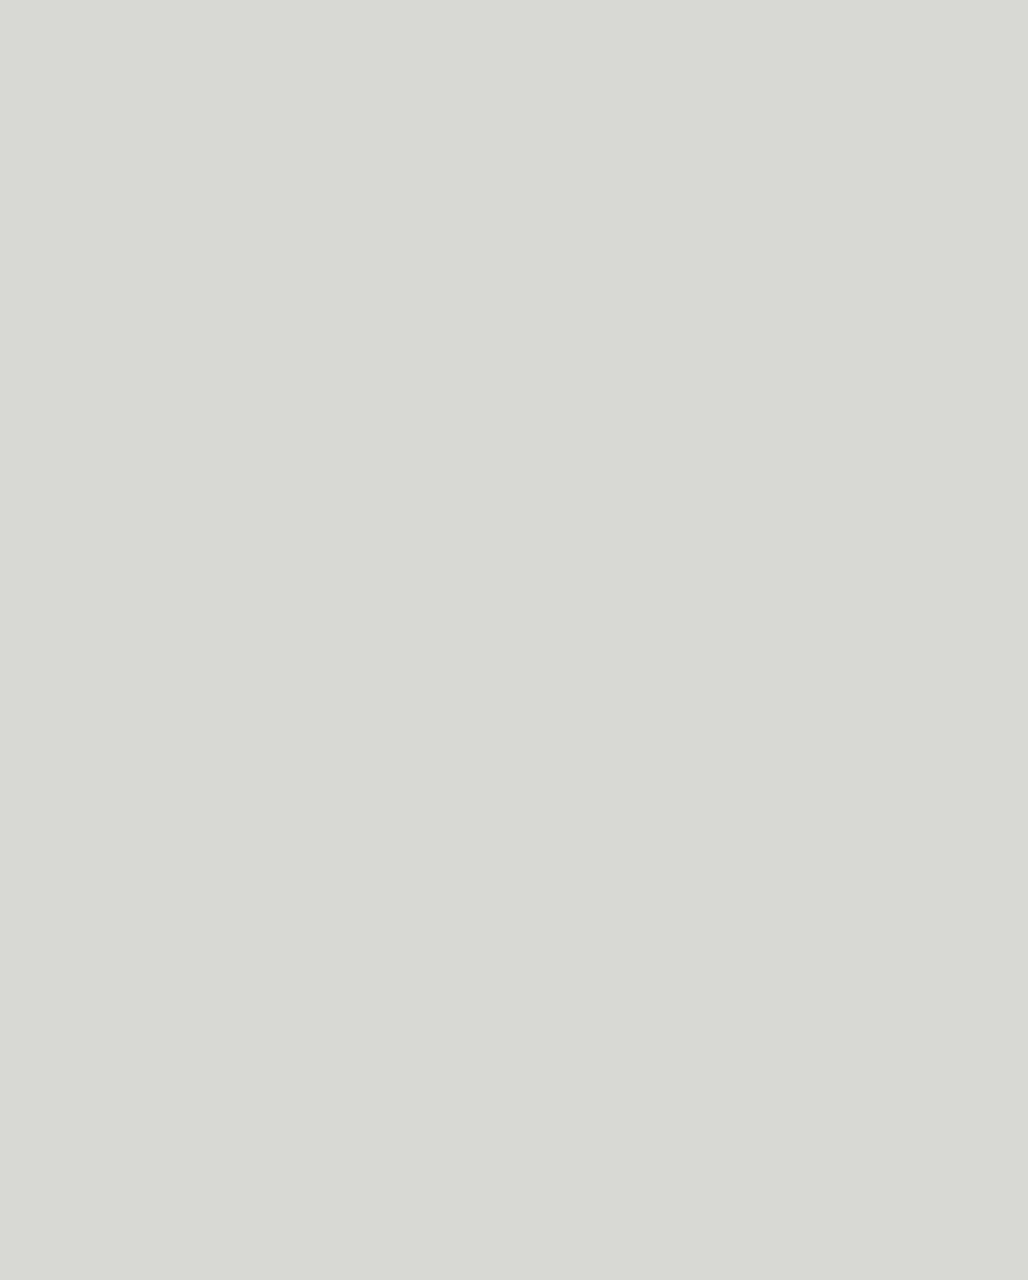 0191 Cool Grey (MF PB sample)